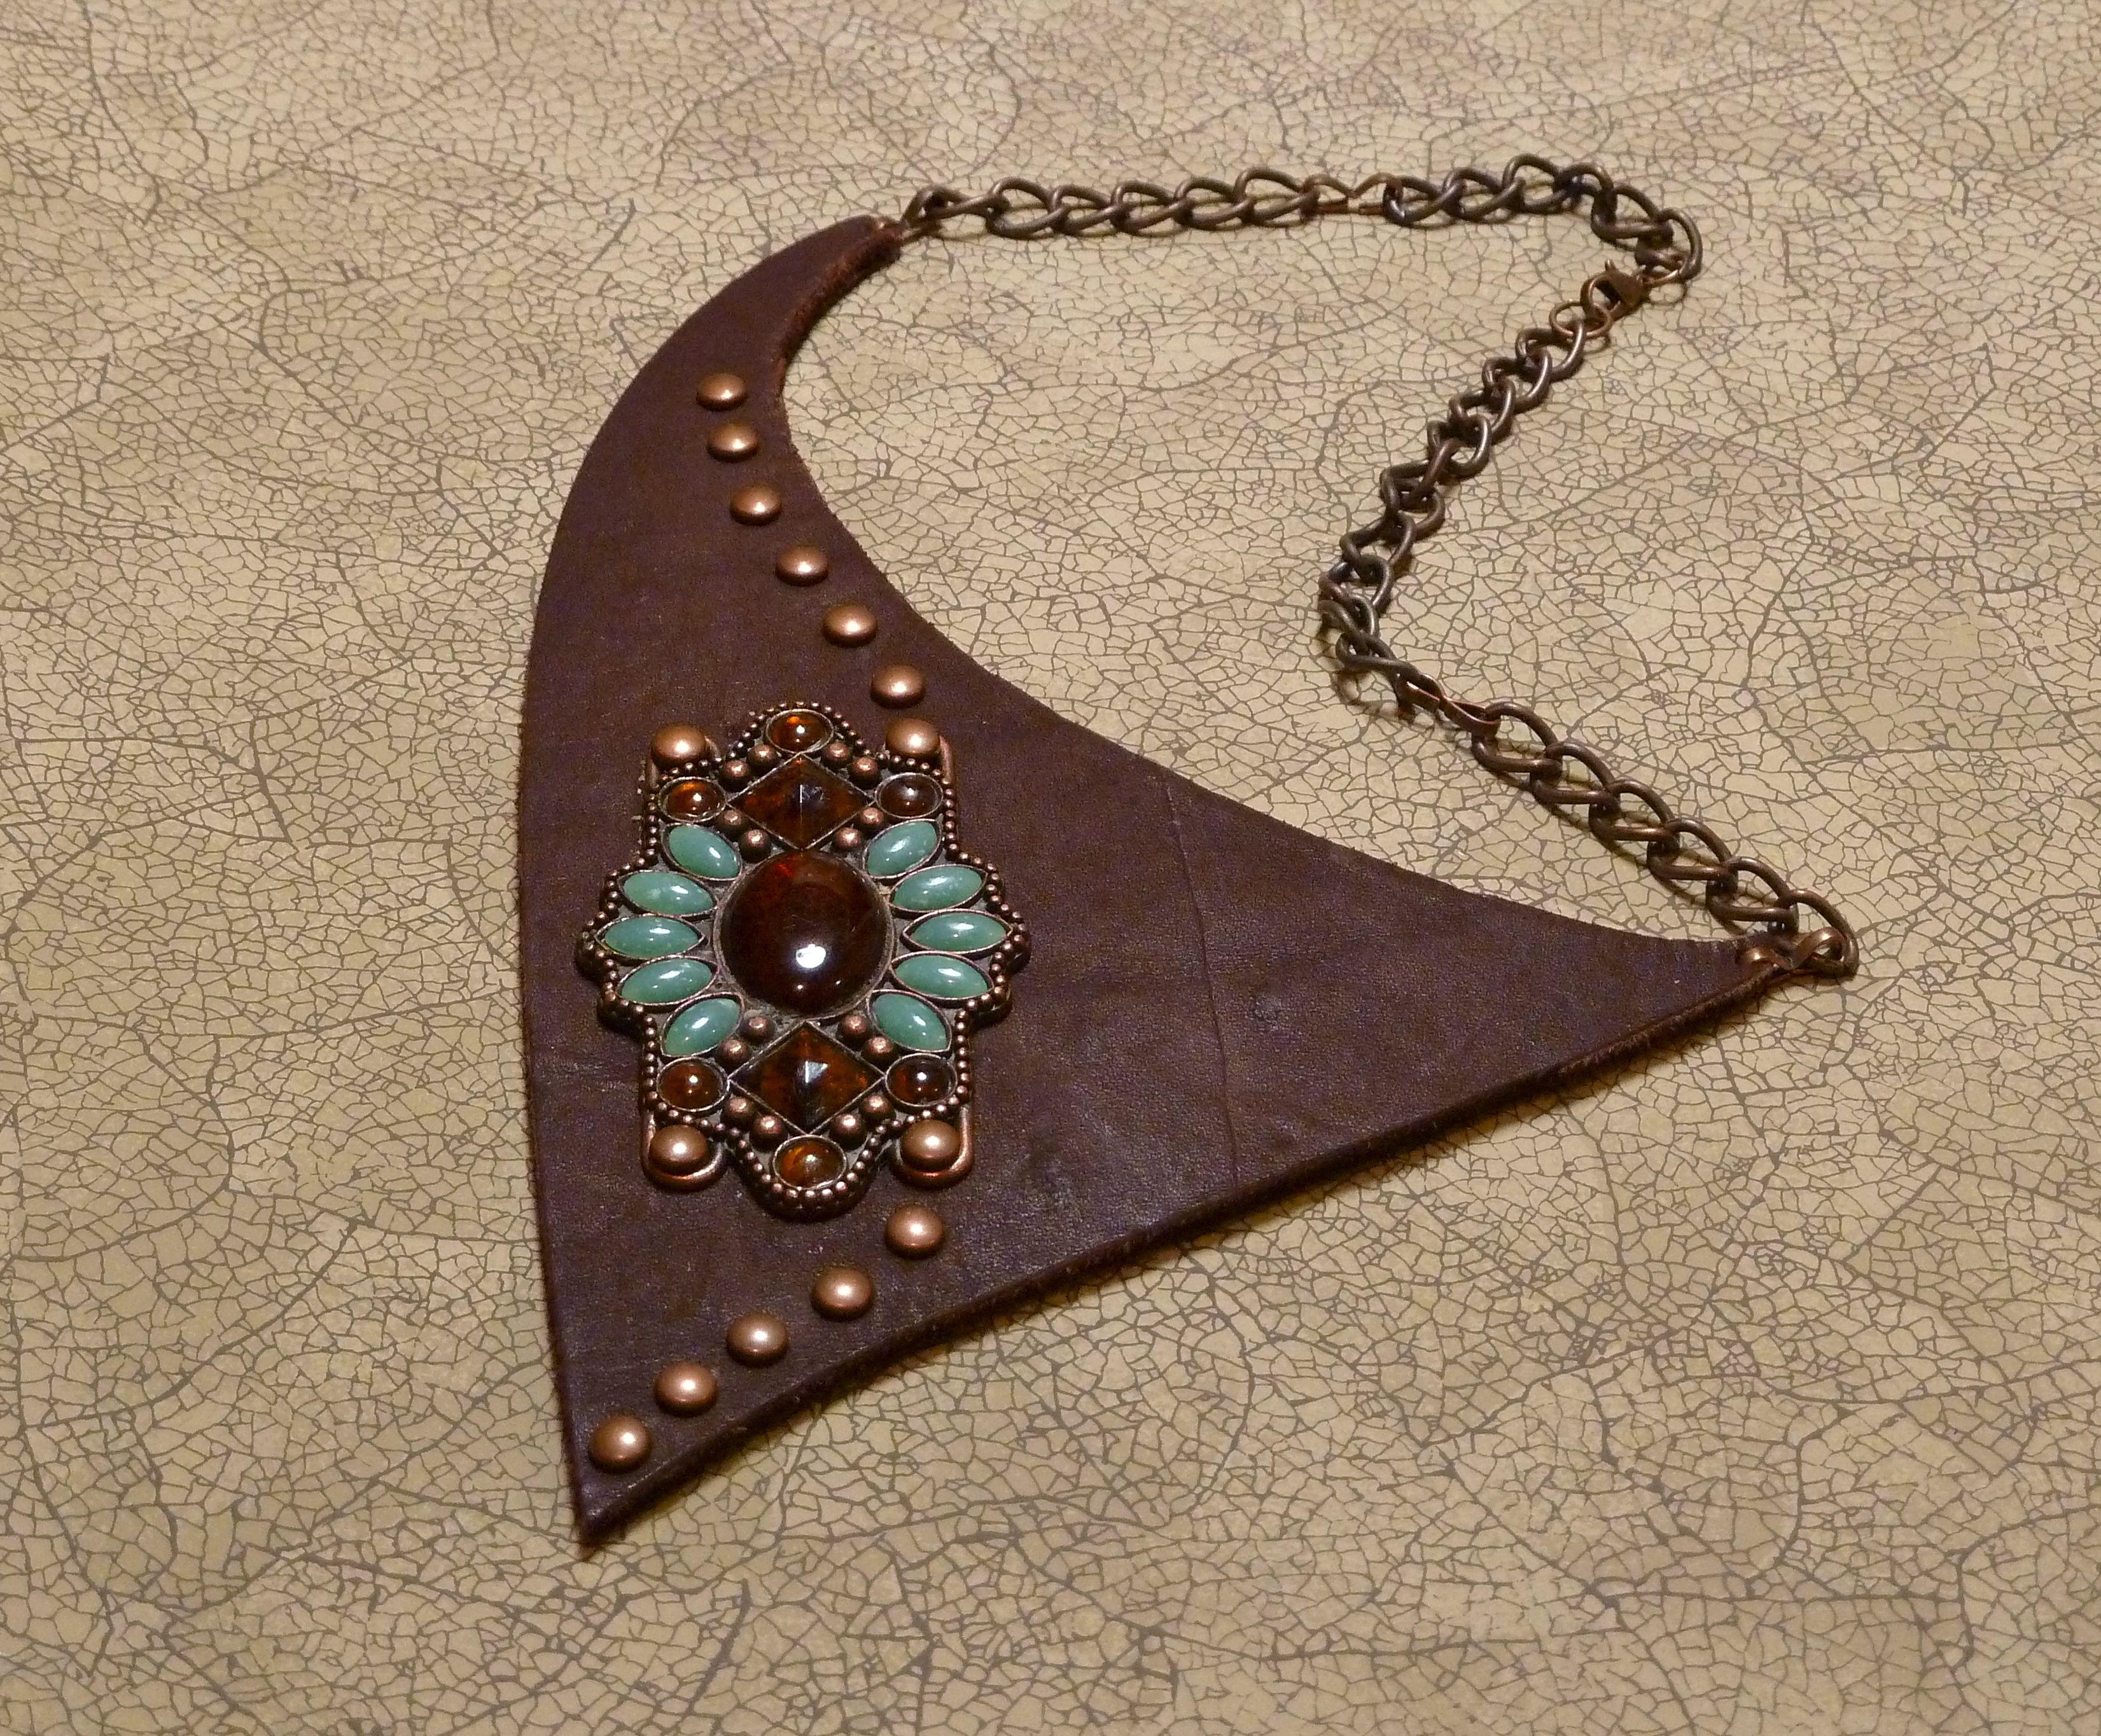 Leather scraps for crafts - Leather Craft Ideas Rl Scrap Leather Metal Belt Segment Brads Craft